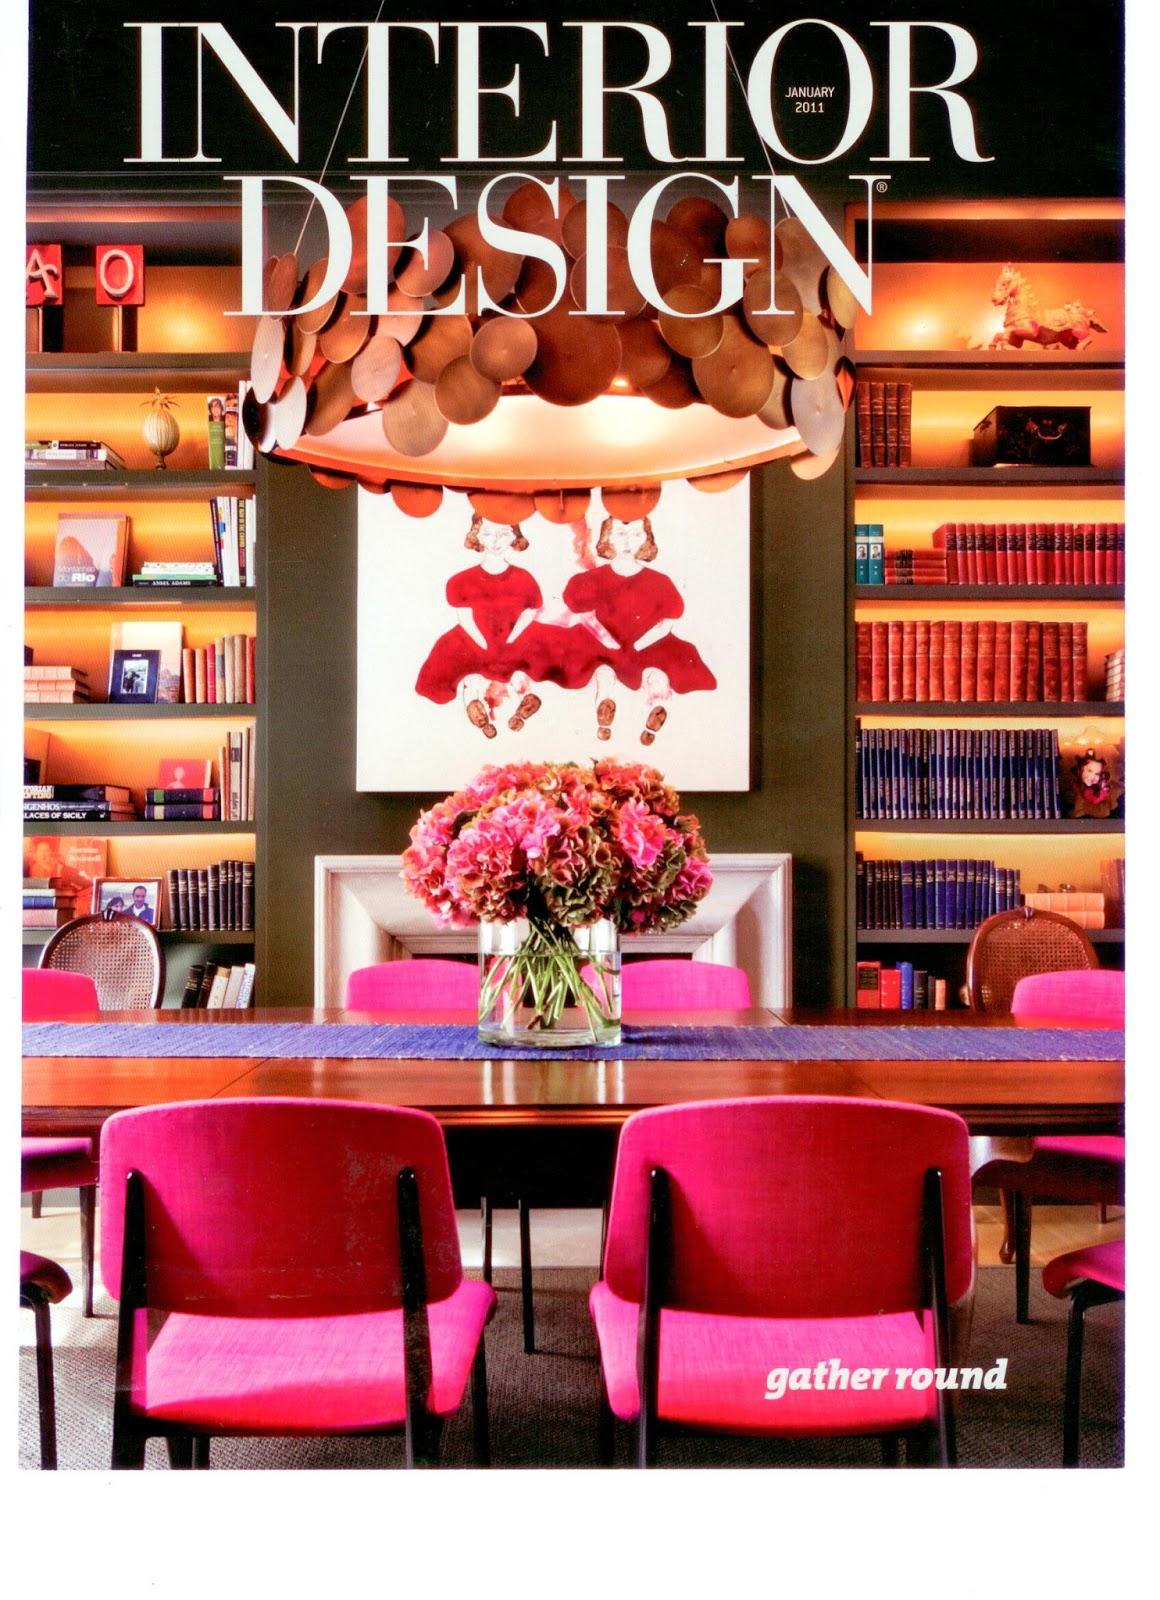 Interior design magazine dreams house furniture for Interior design magazin